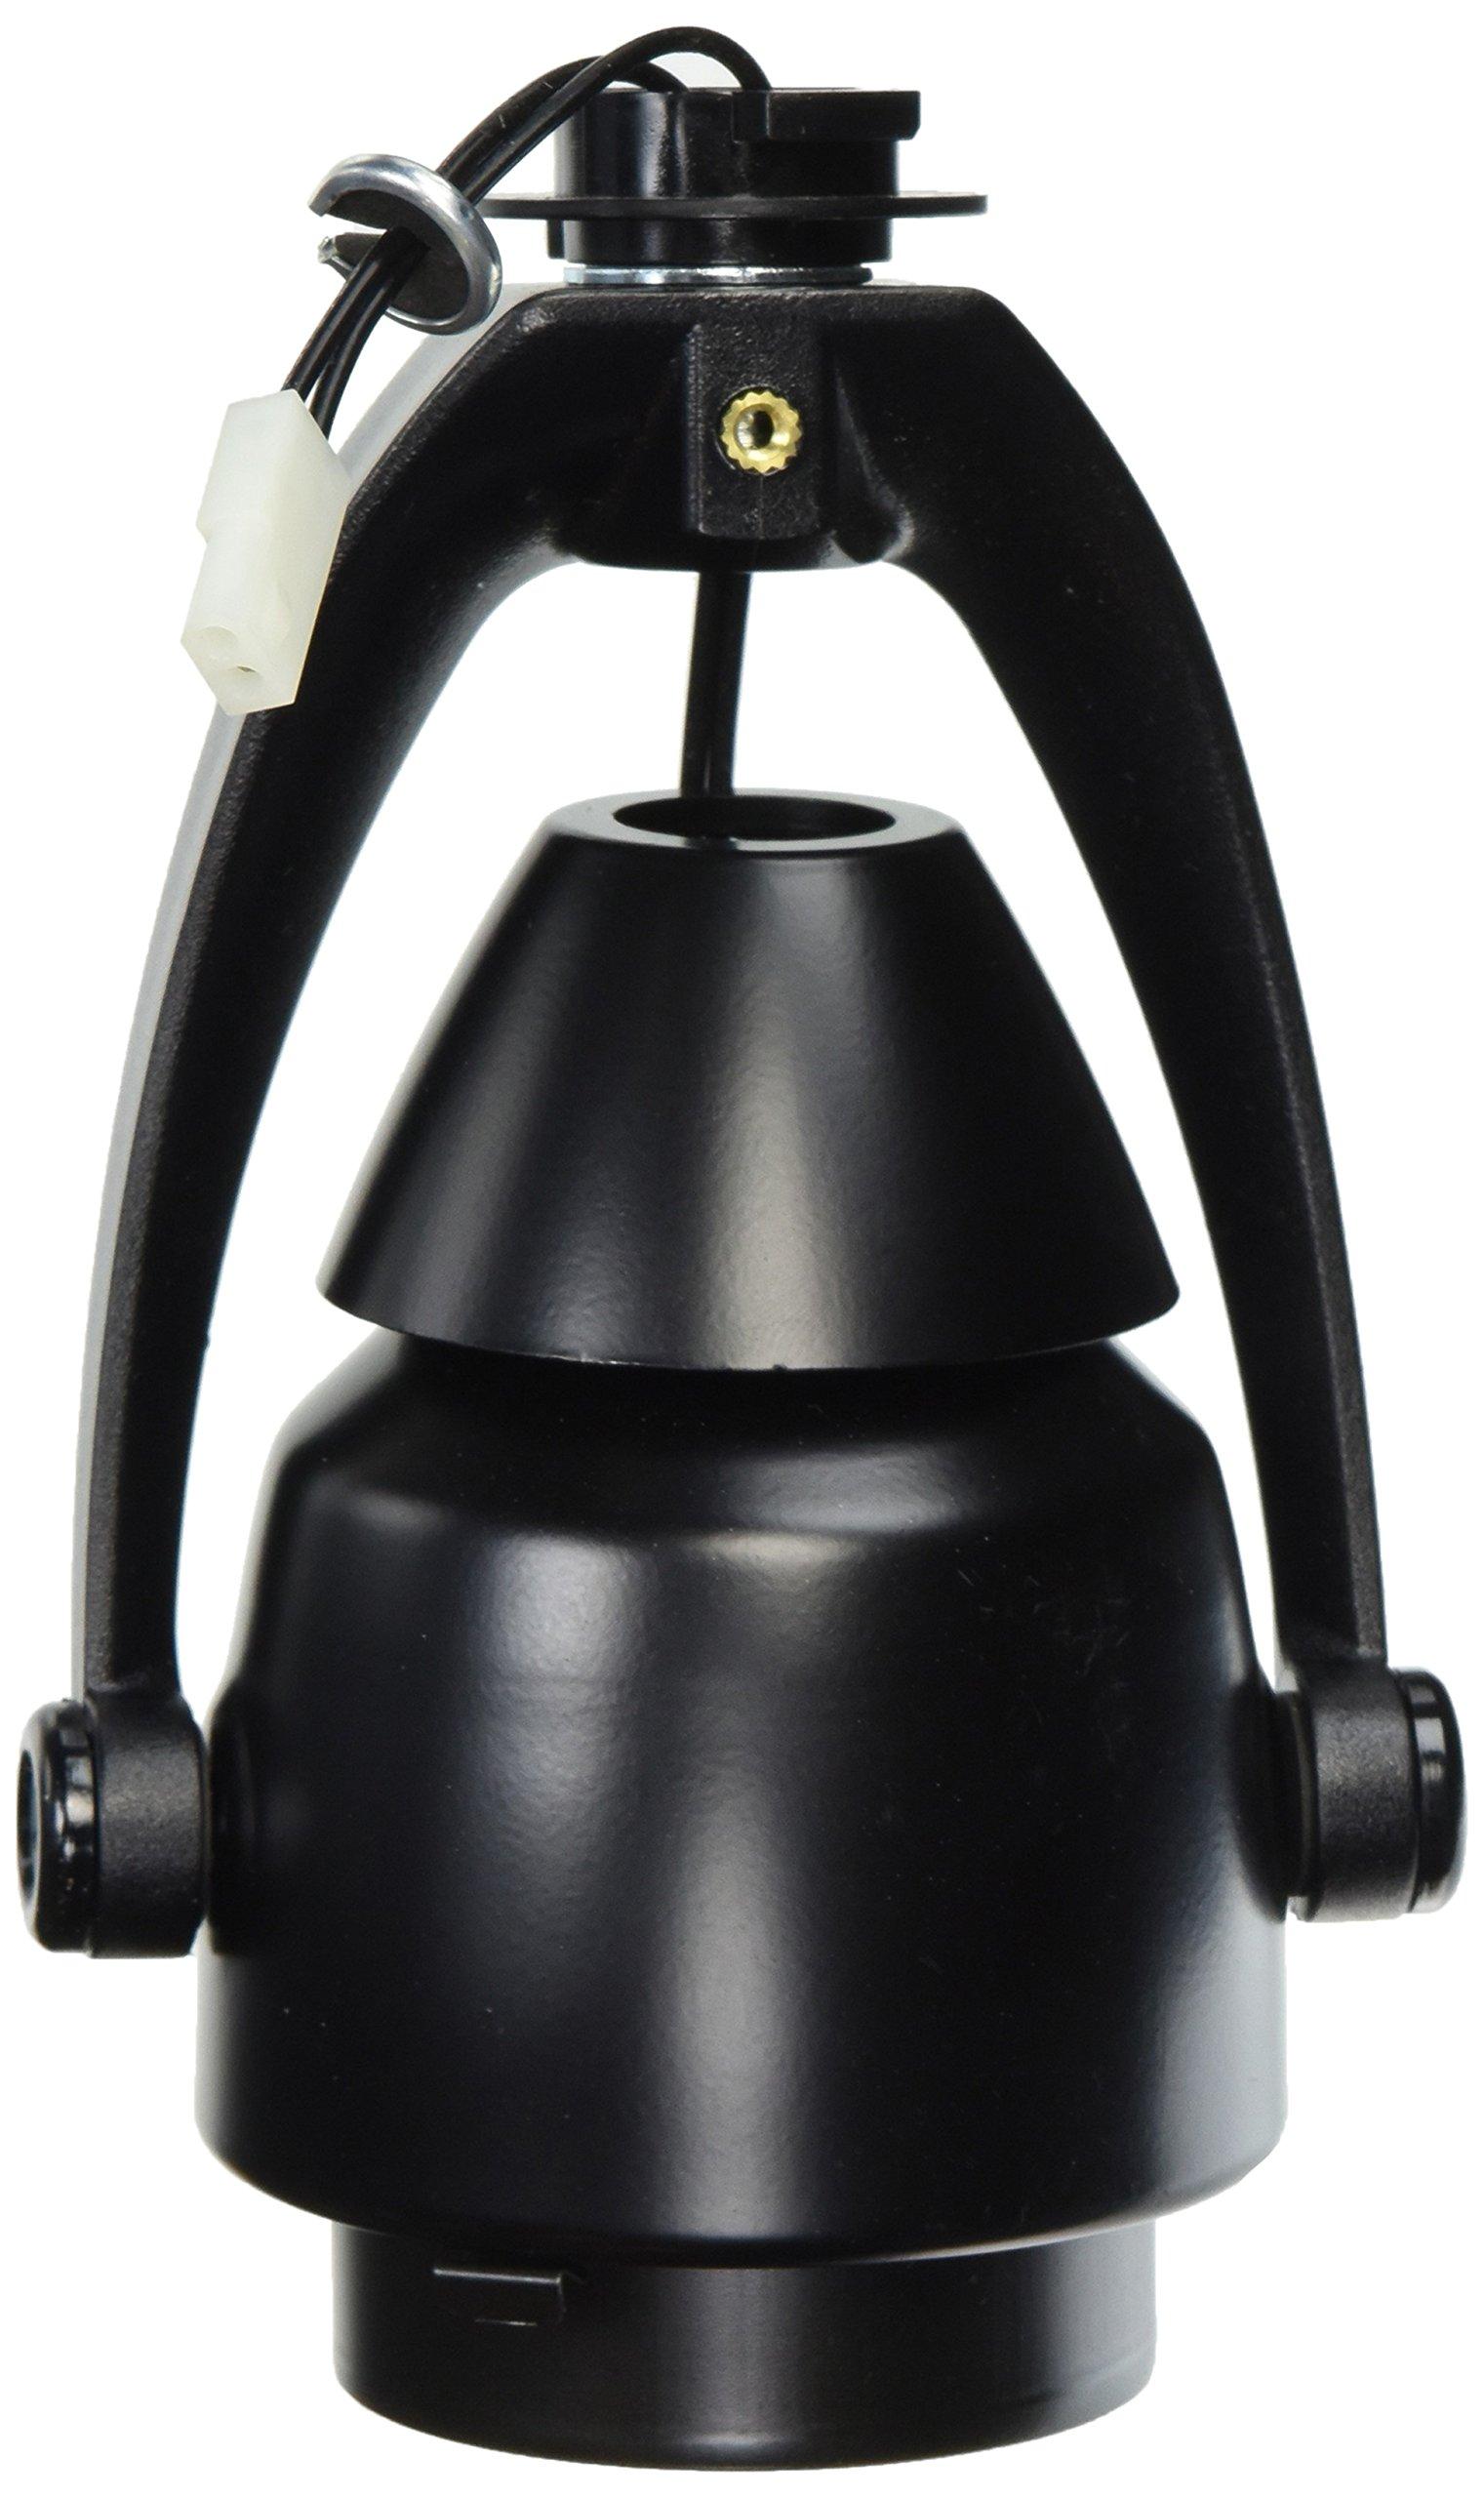 Juno Lighting T406BL Trac-Master Conix Low Voltage MR16 Lampholder, Black